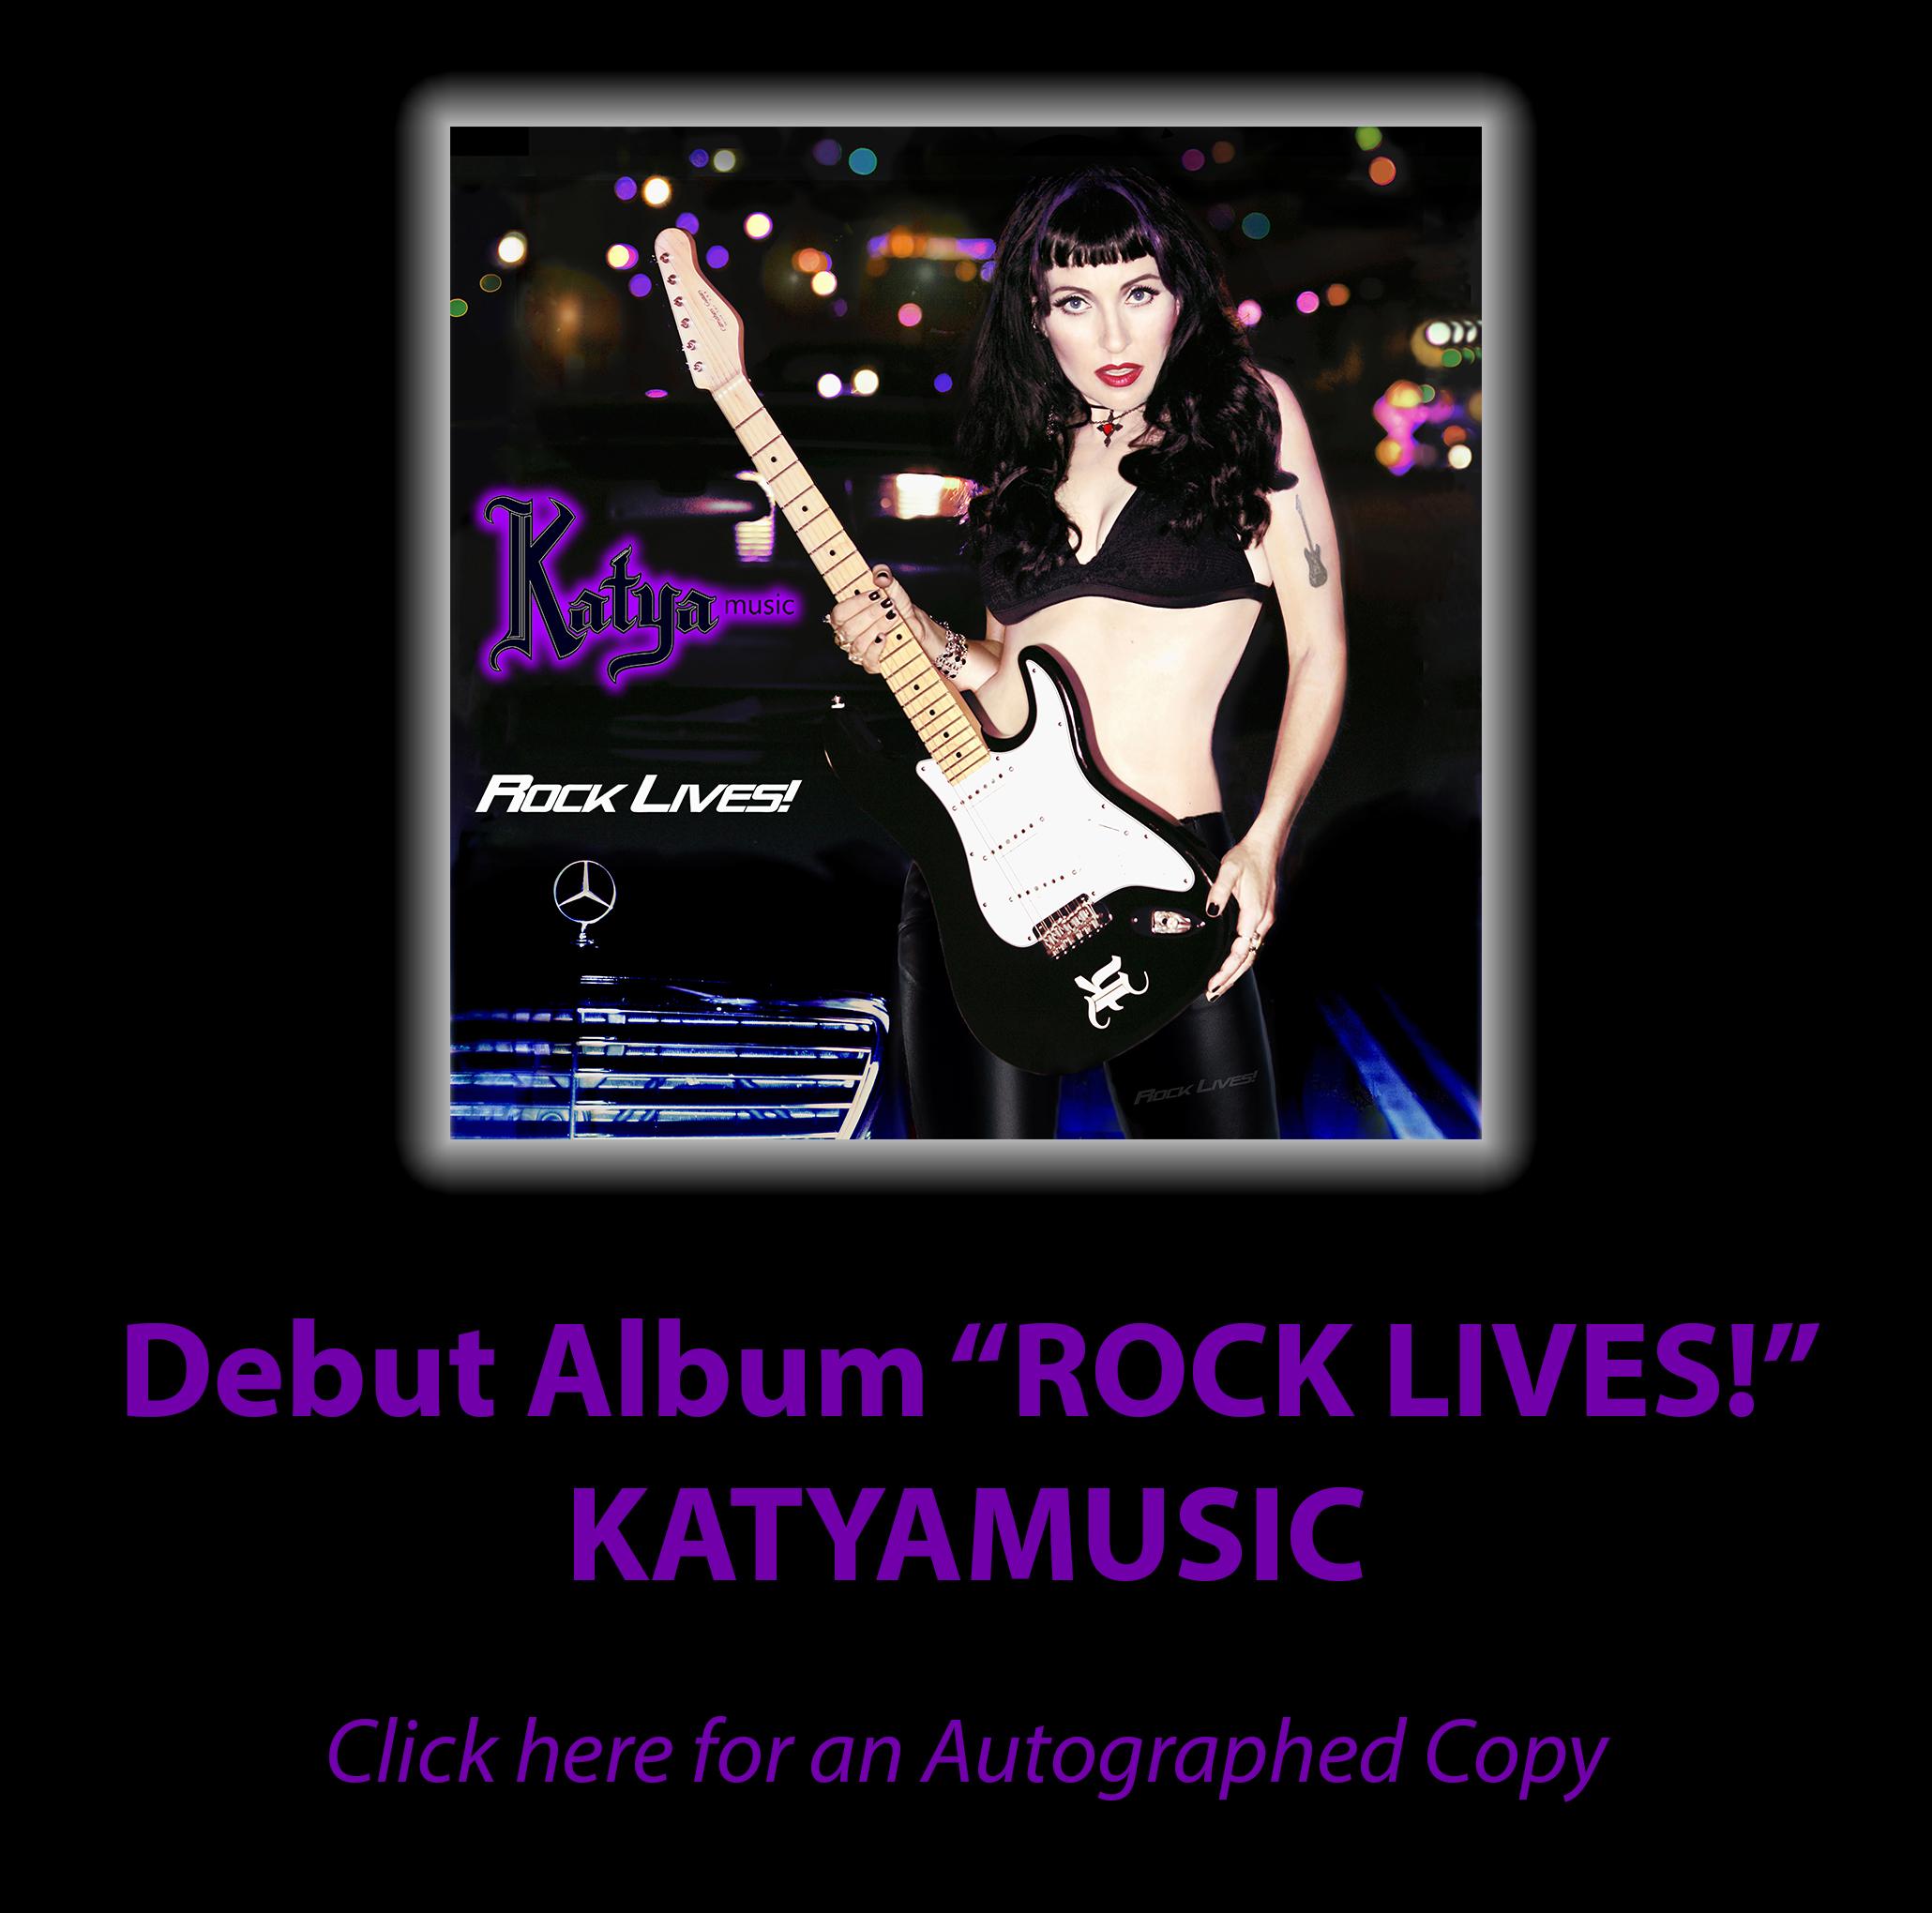 BUY KATYAMUSIC'S CD